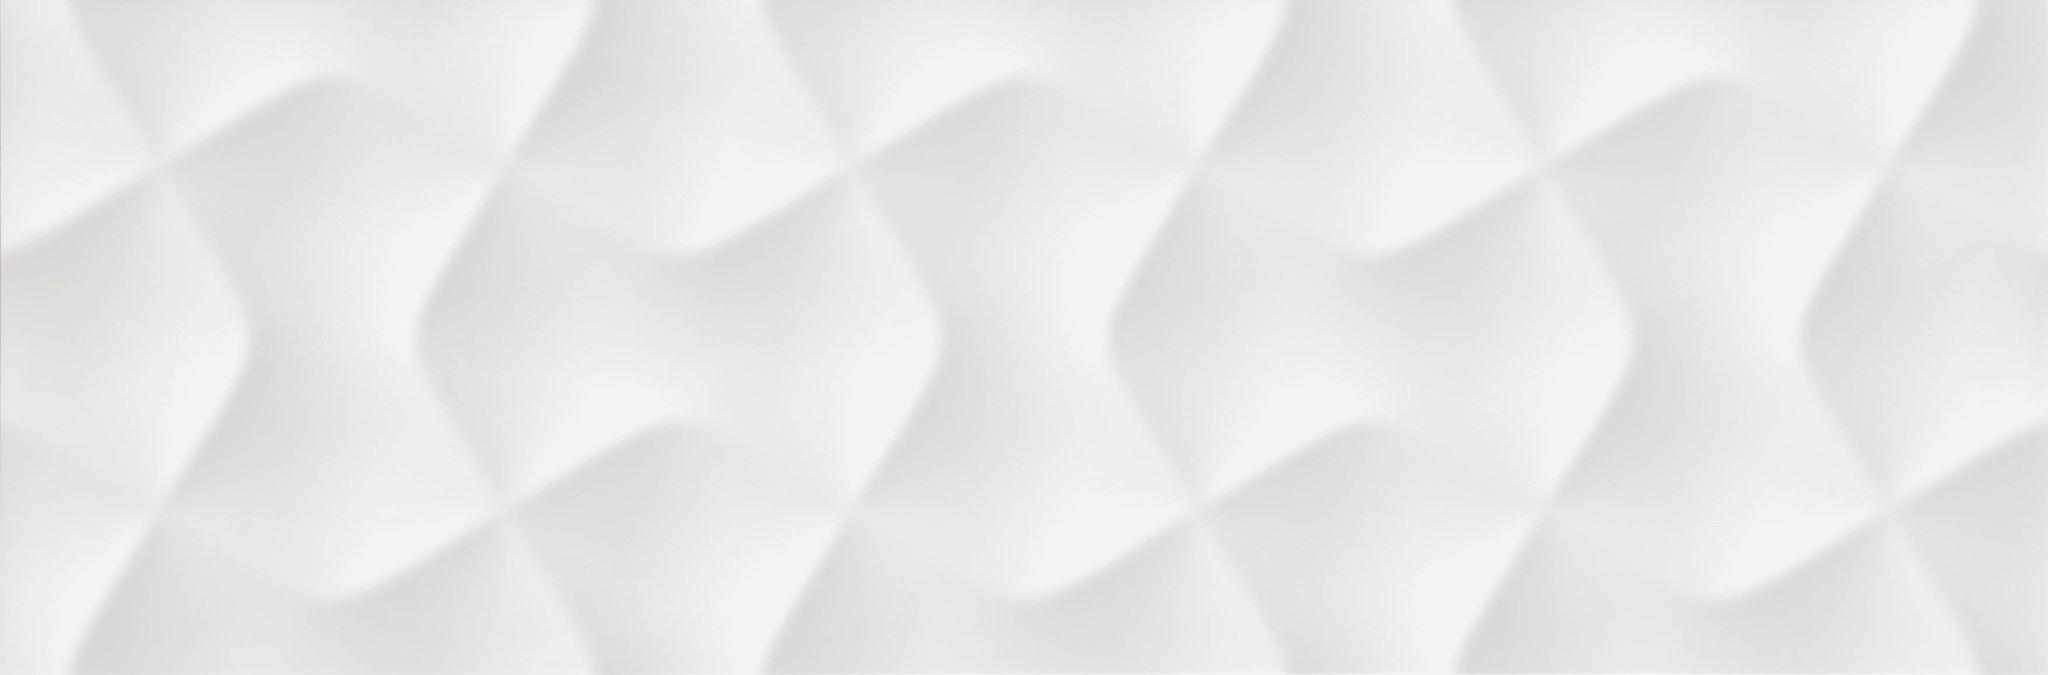 Scala dekoor (Artes) white glossy 140210 20x60 - Hansas Plaadimaailm